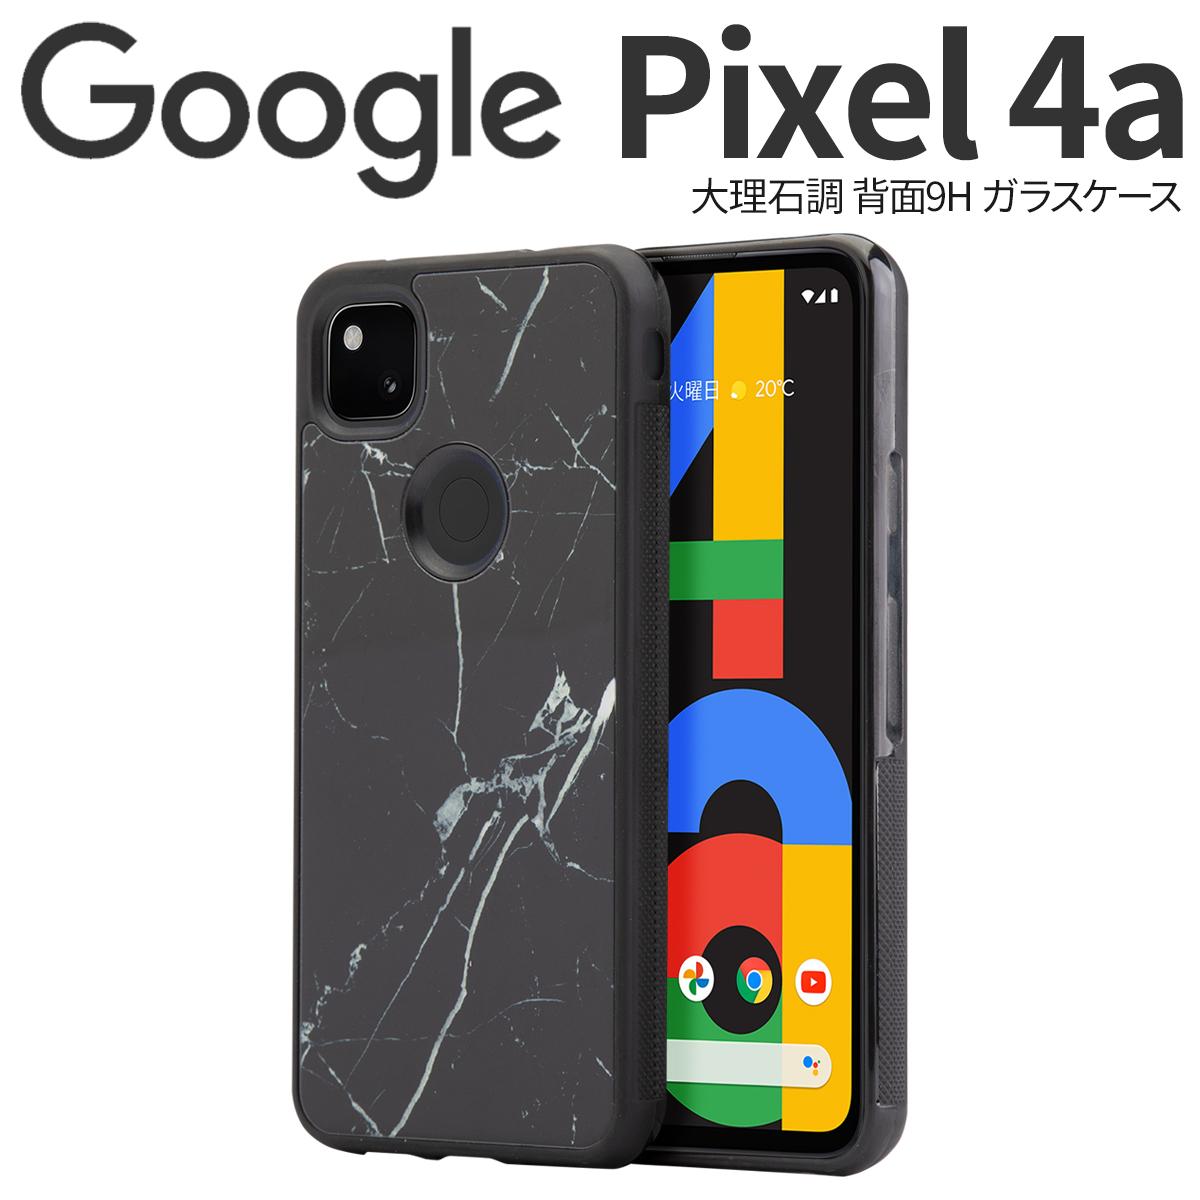 Google Pixel 4a 大理石調 背面9H ガラスケース